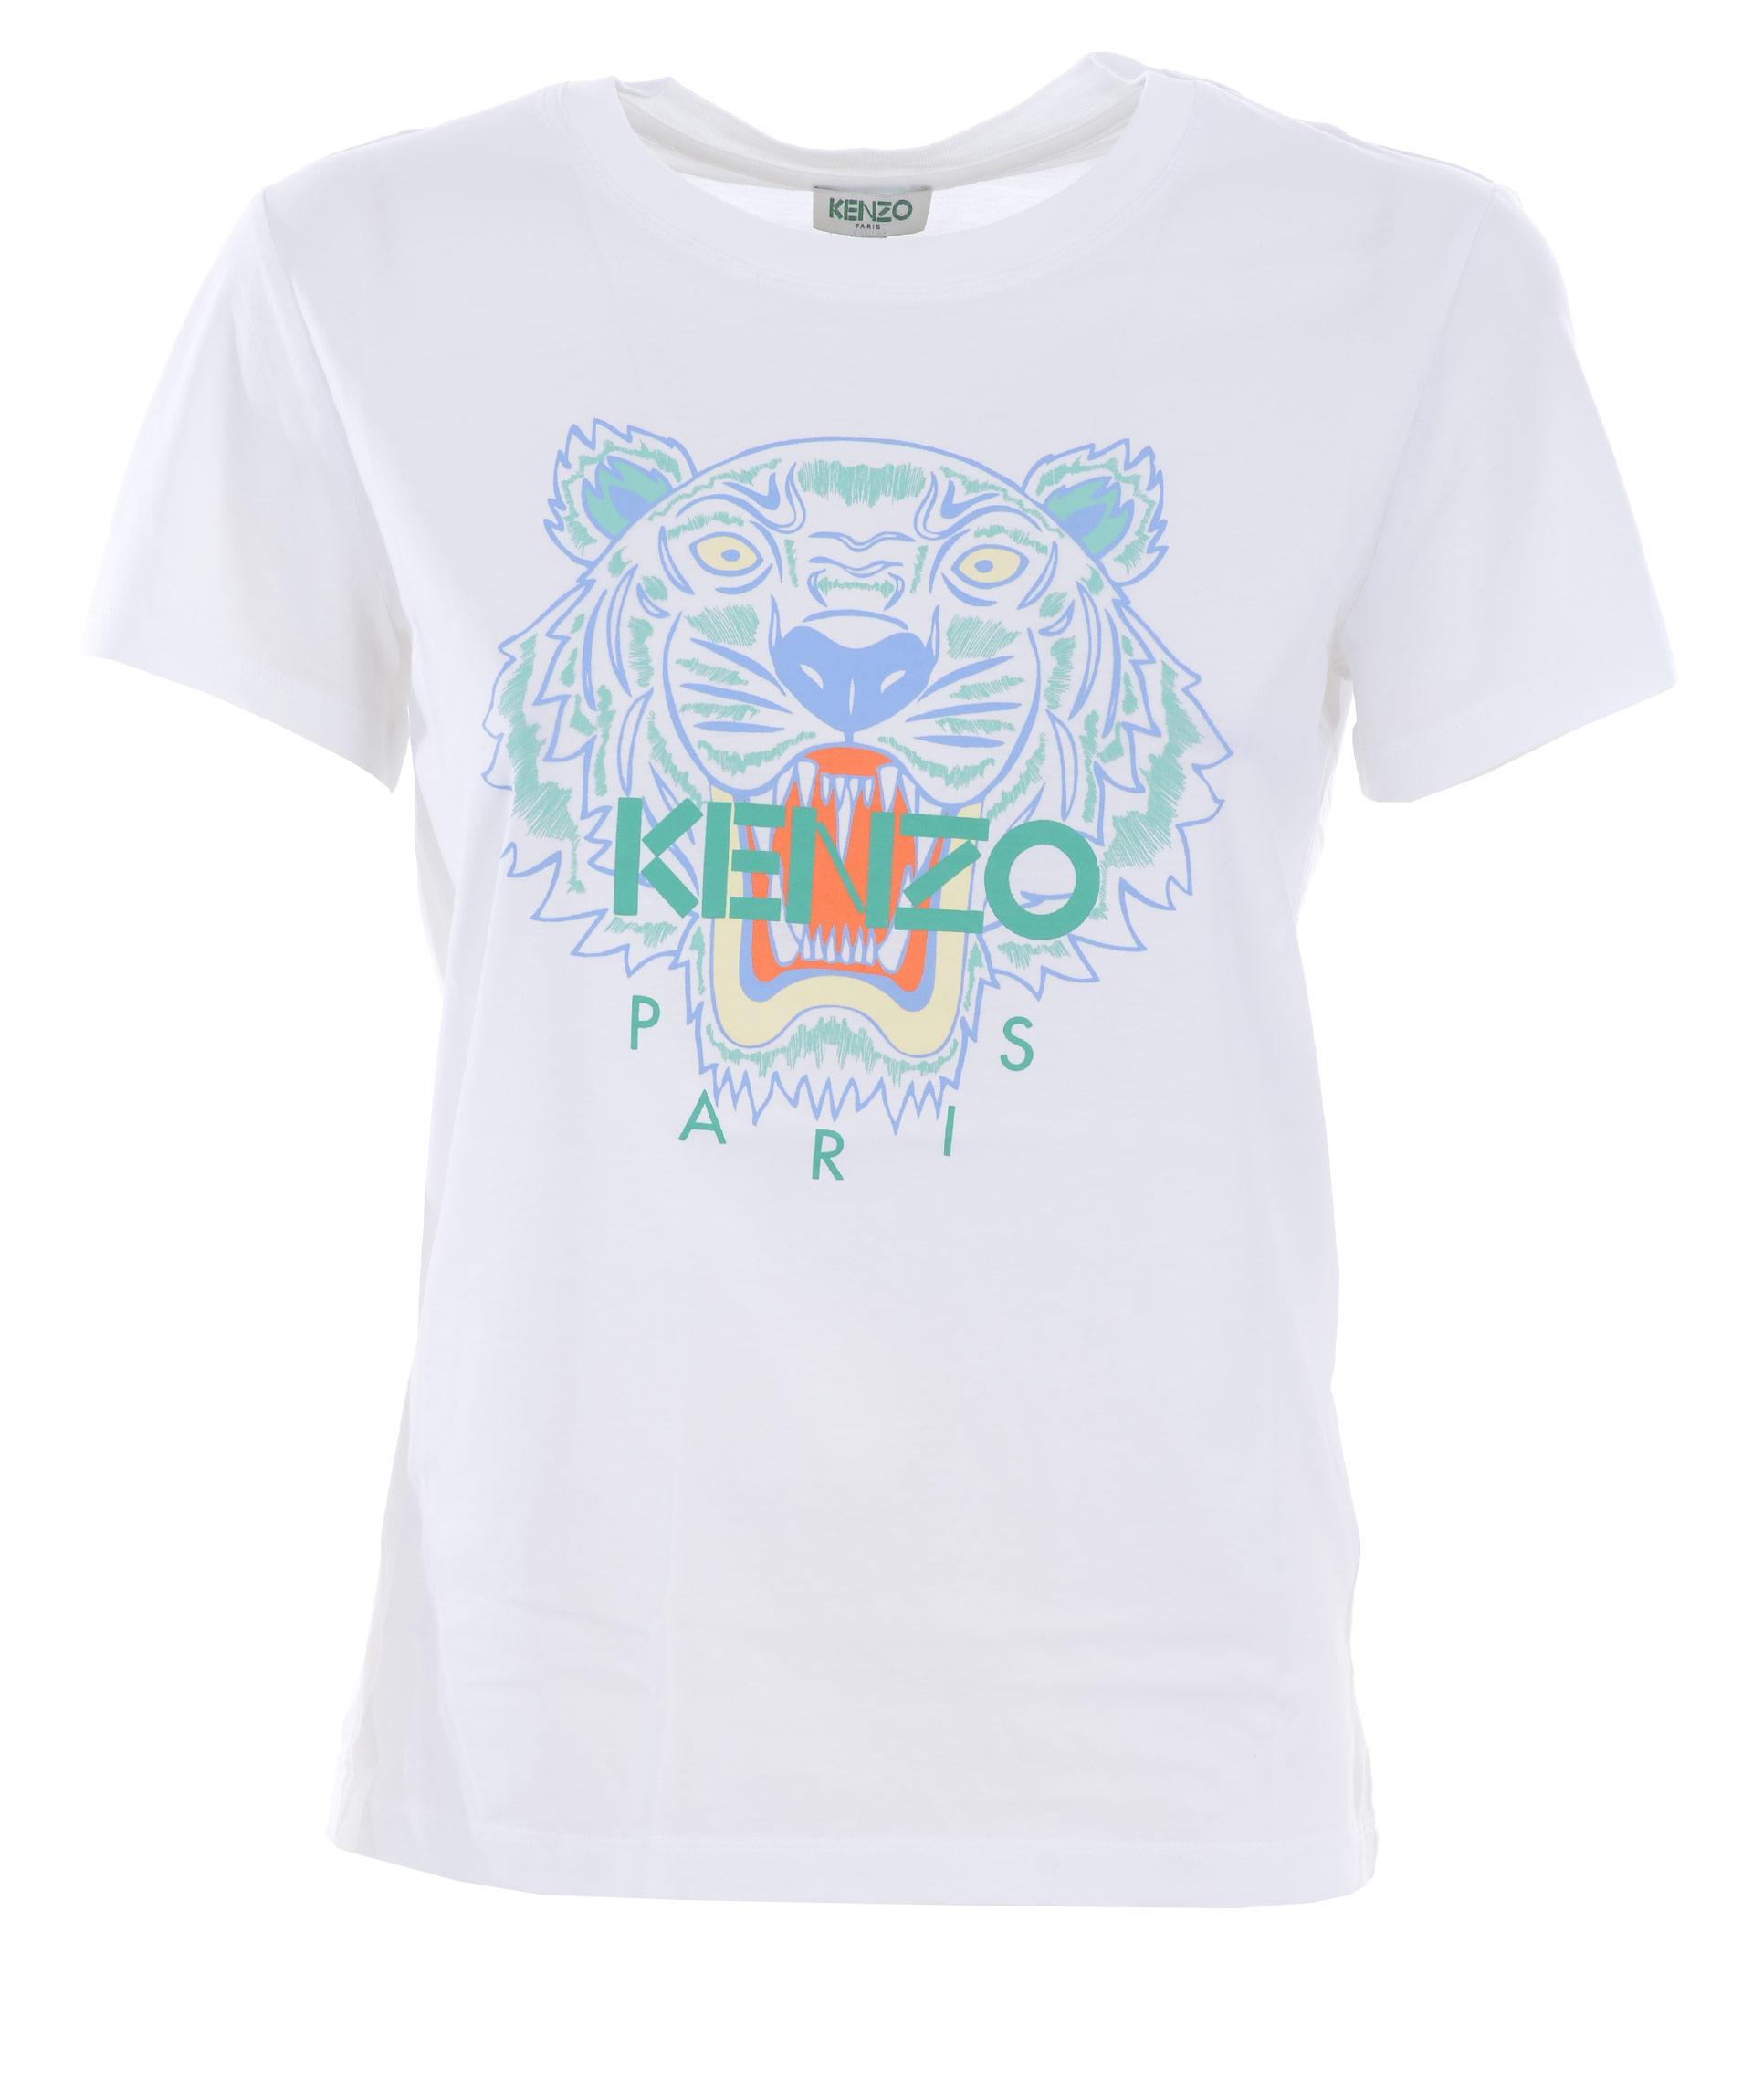 T-shirt Kenzo tigre